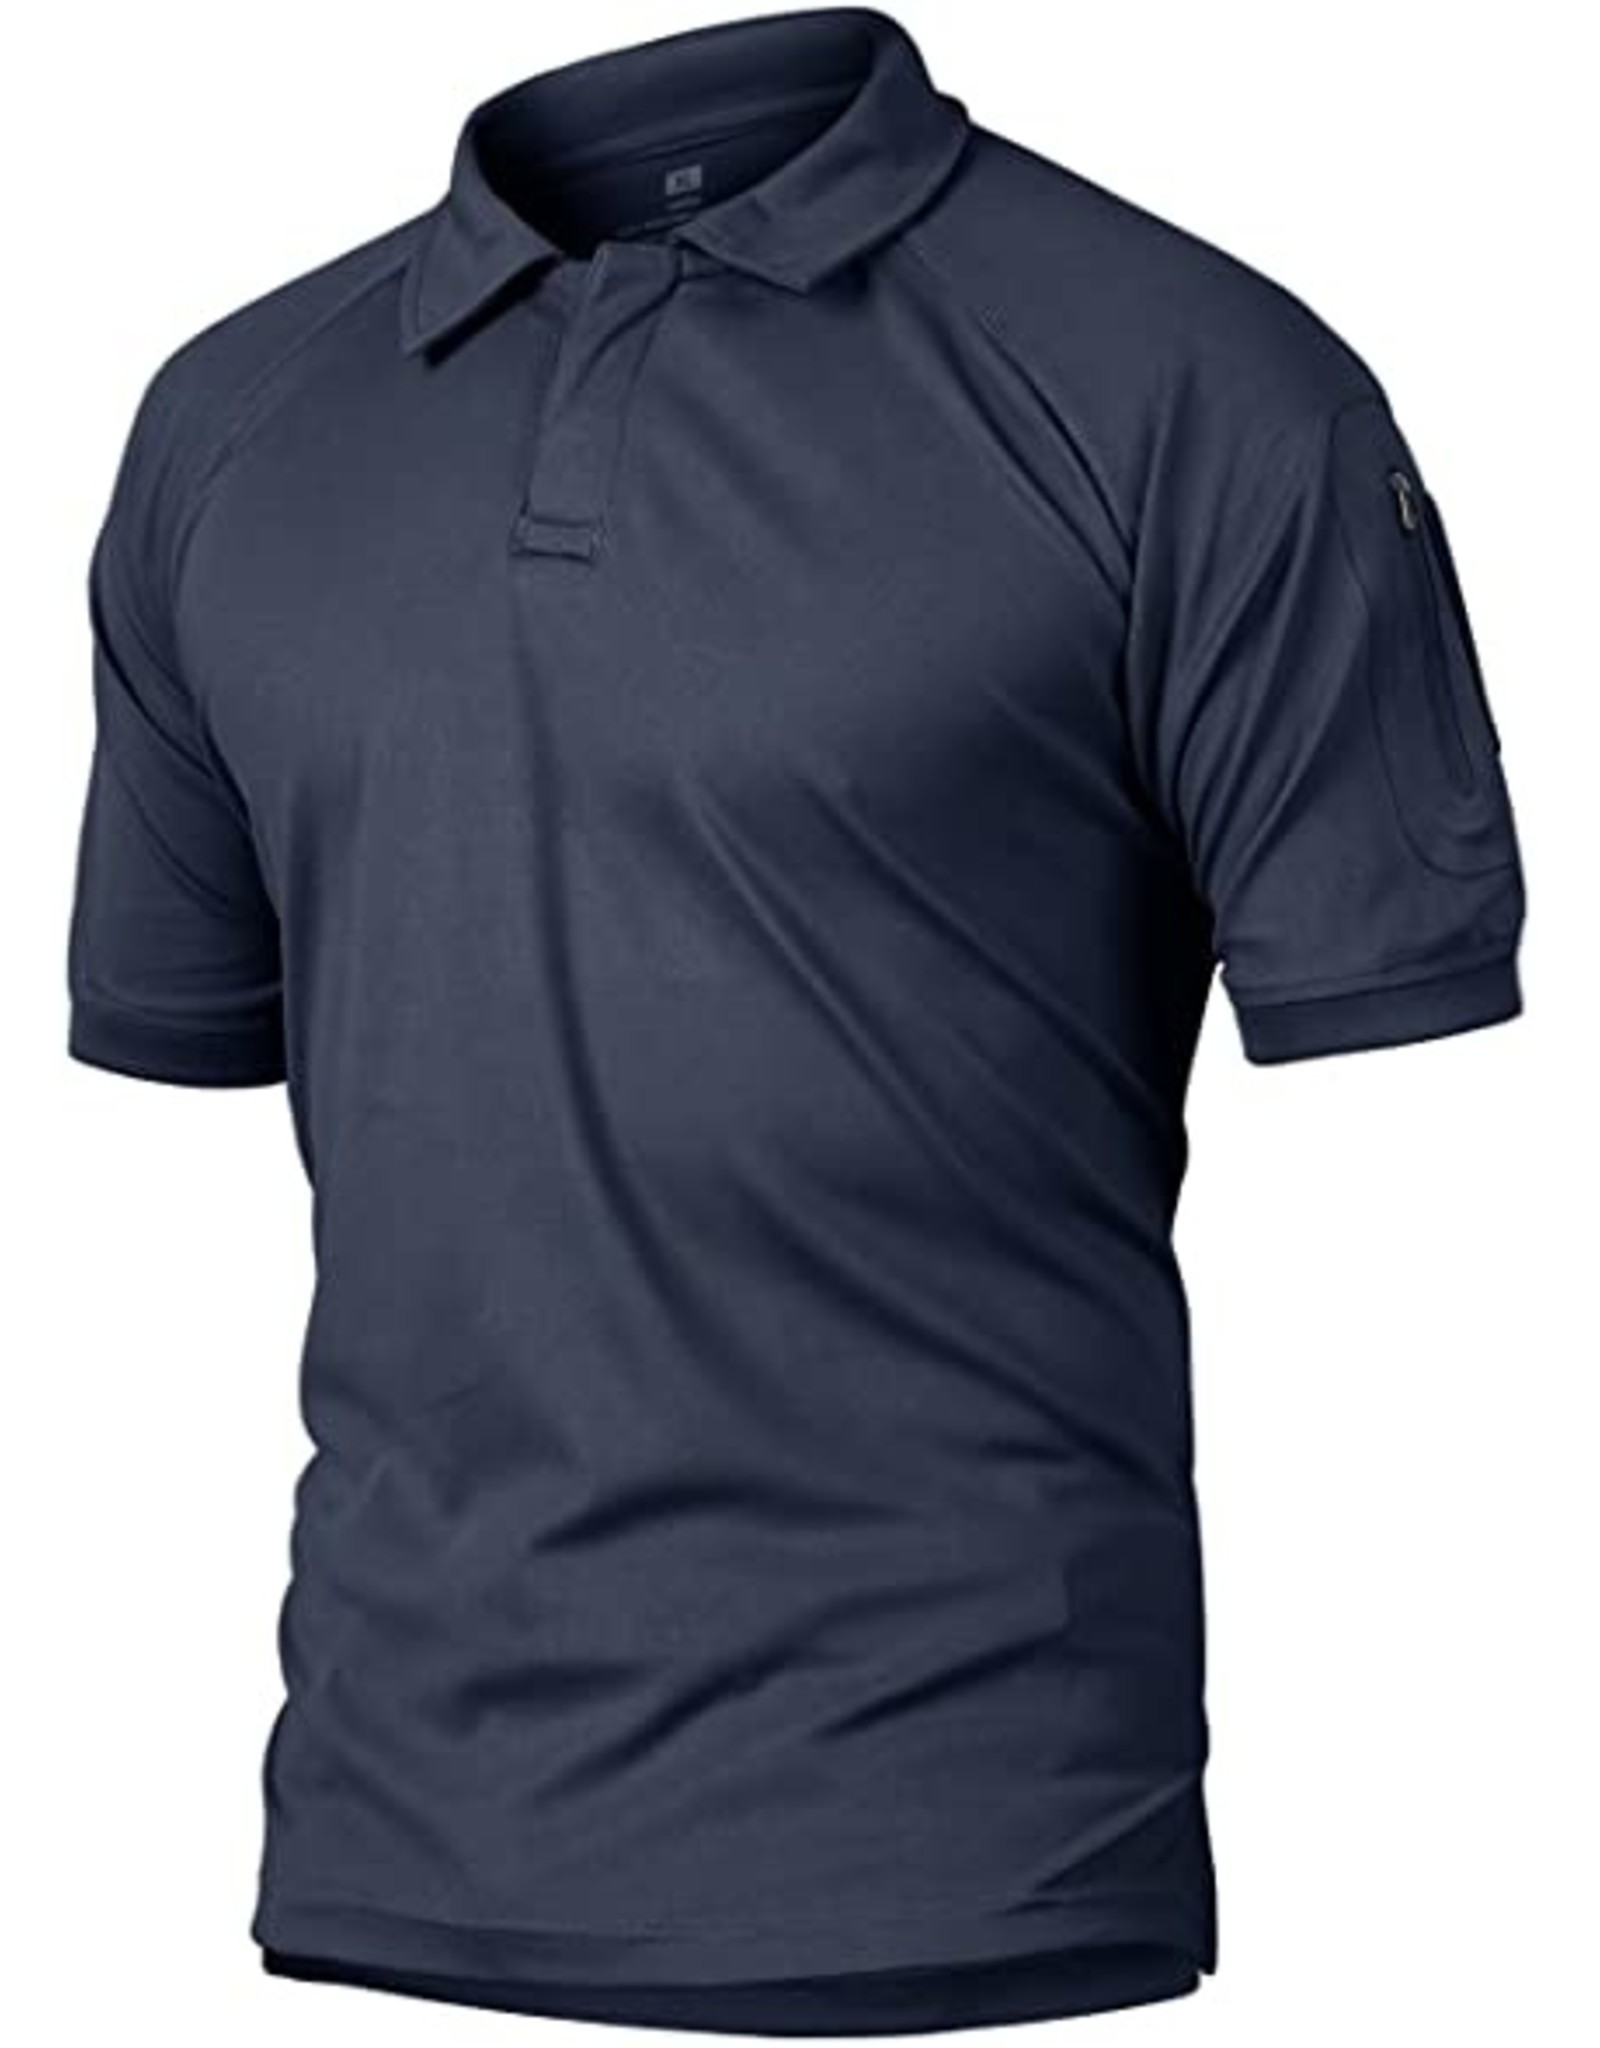 Crysully Crysully Mens Bottons Shirt Urban Sportswear Uniform Short Sleeve Leisure Polo Shirt (Blue - Large)